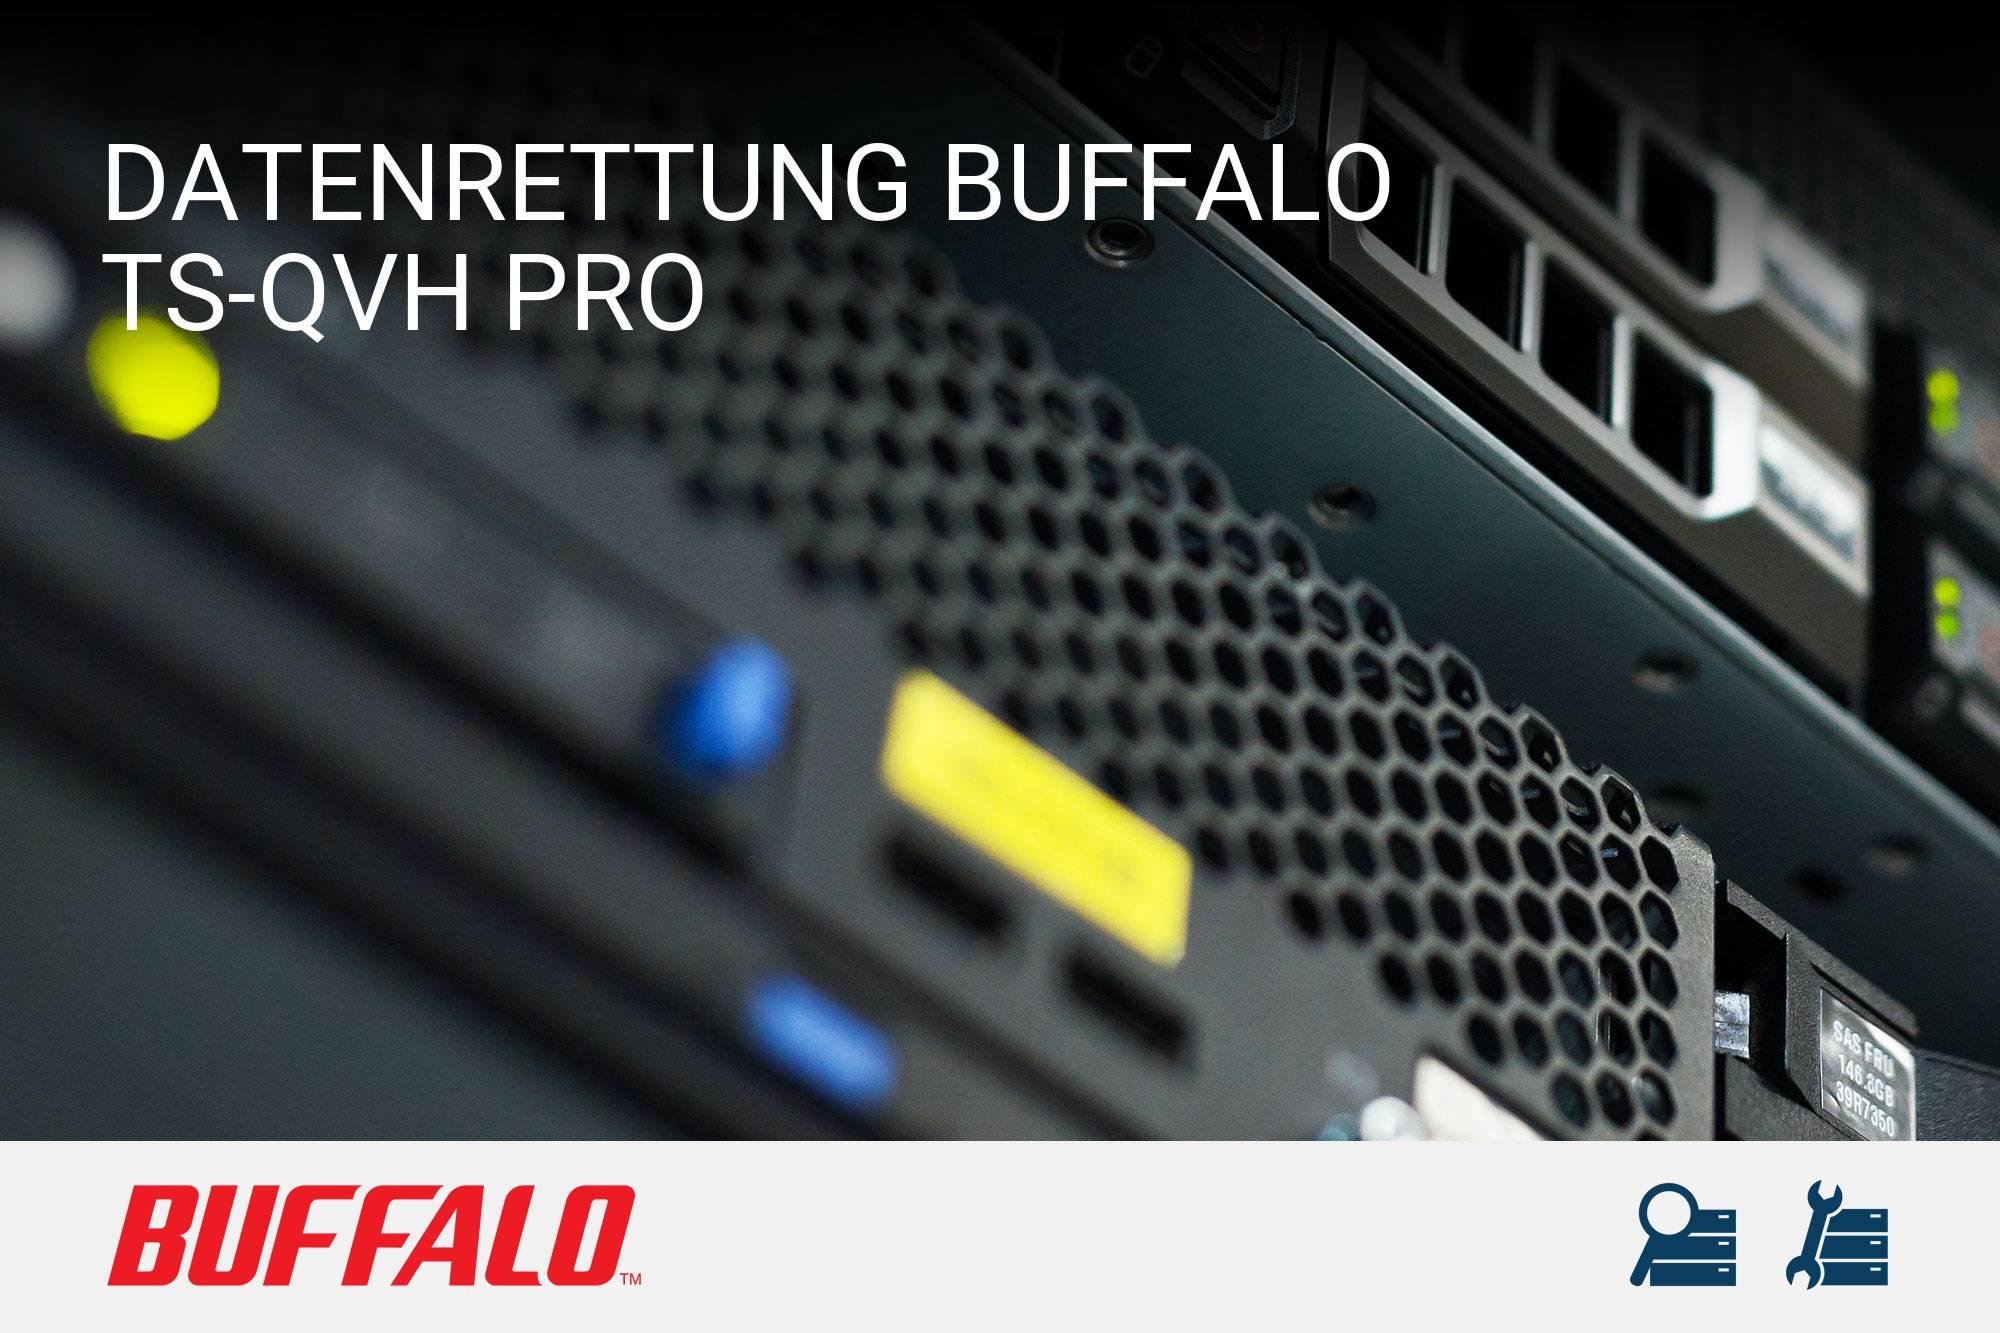 Buffalo TS-QVH Pro